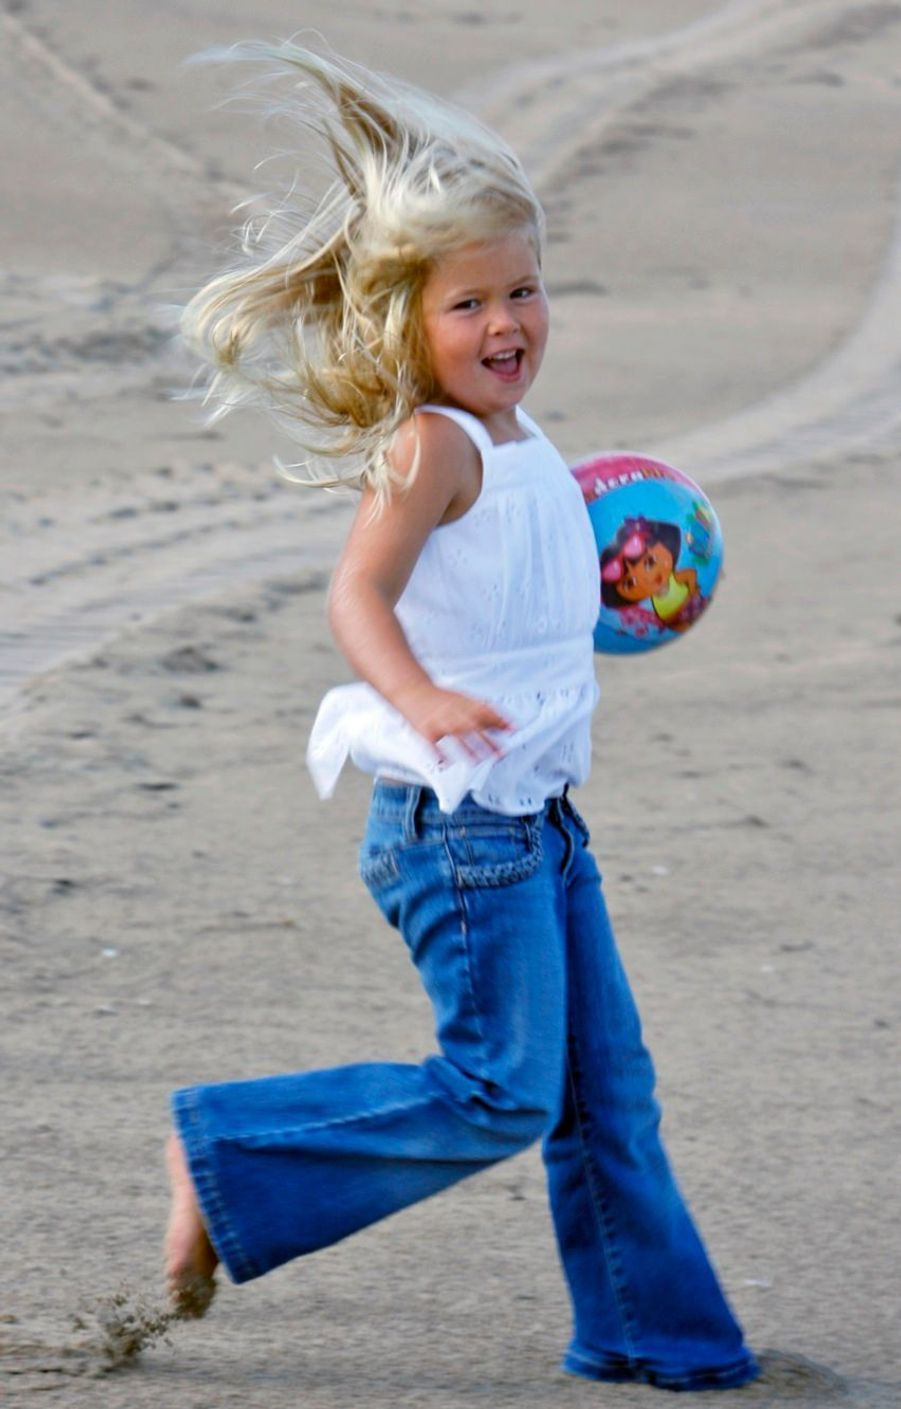 La princesse Catharina-Amalia sur la plage en juillet 2009